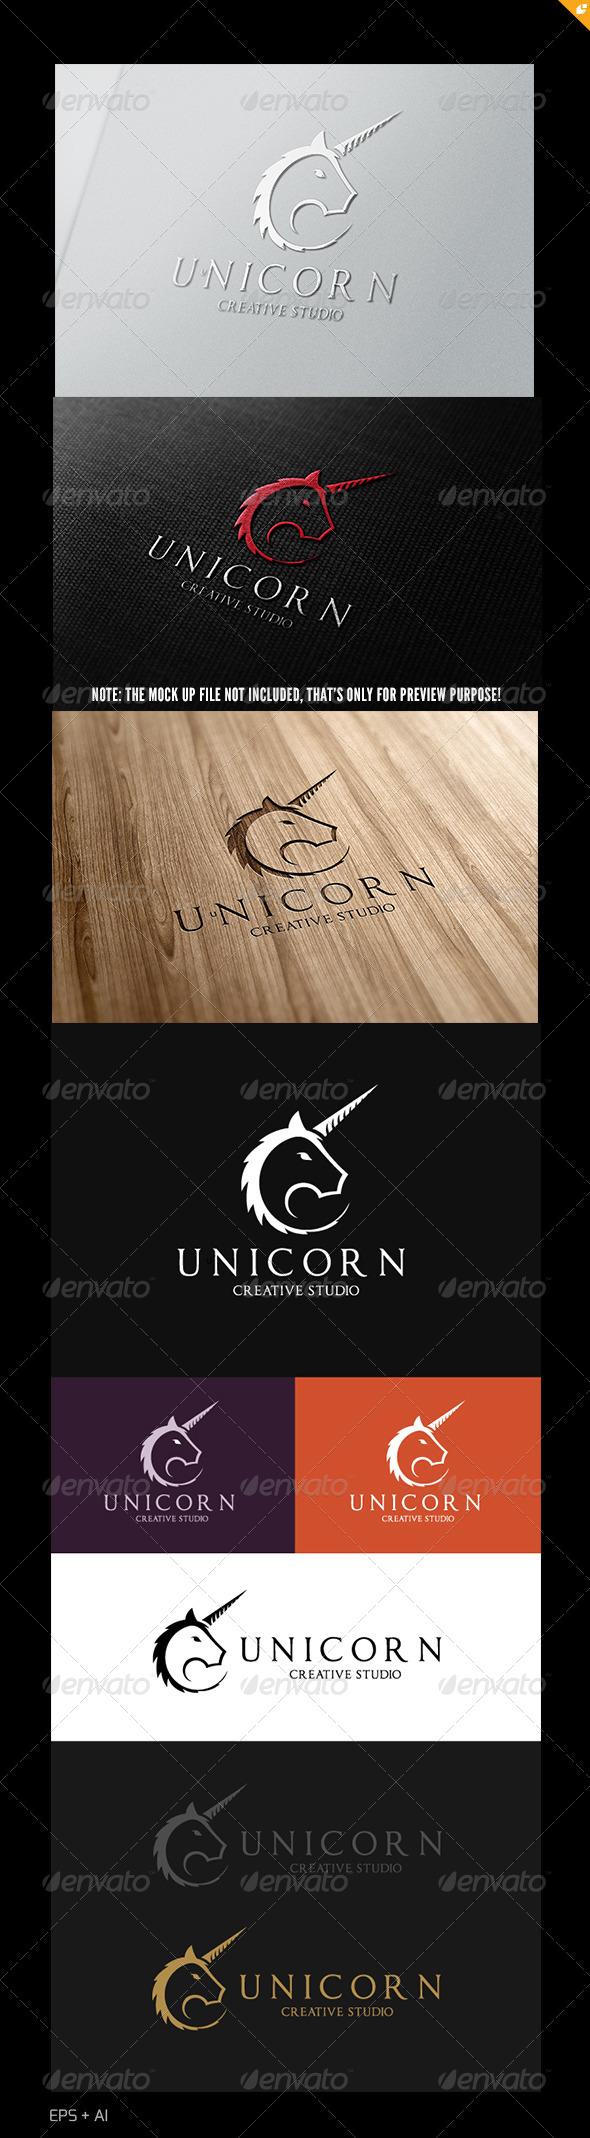 Unicorn Creative Studio Logo